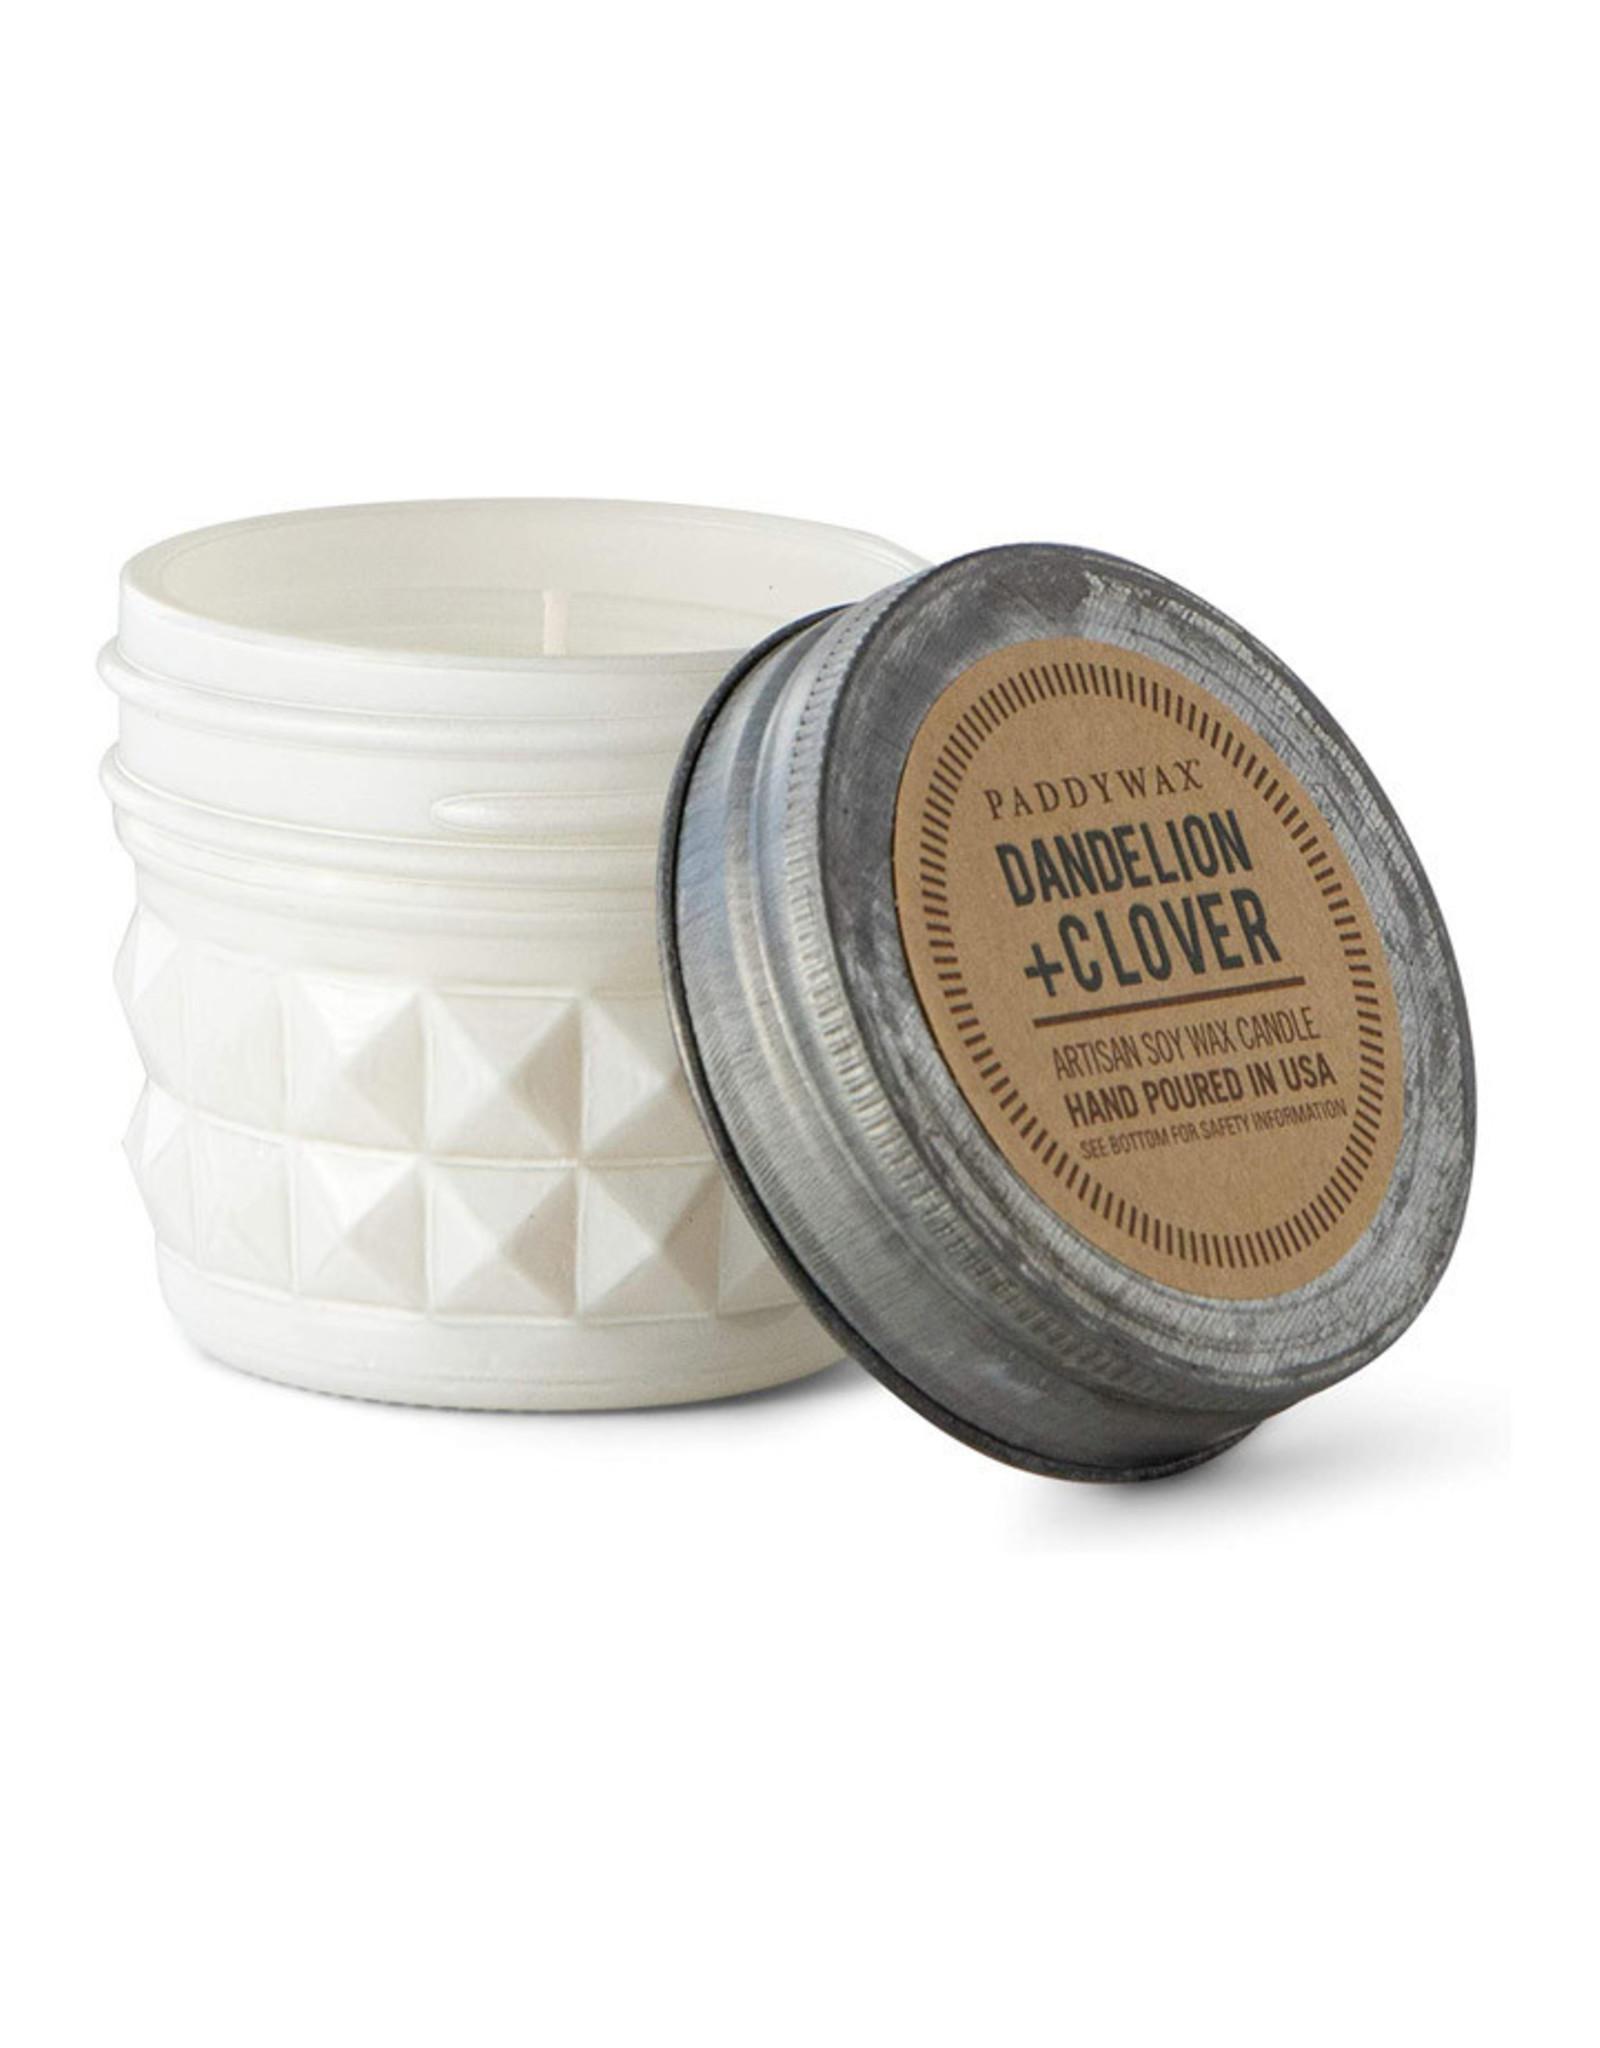 Paddywax Relish Jar 3 oz candle - Dandelion & Clover